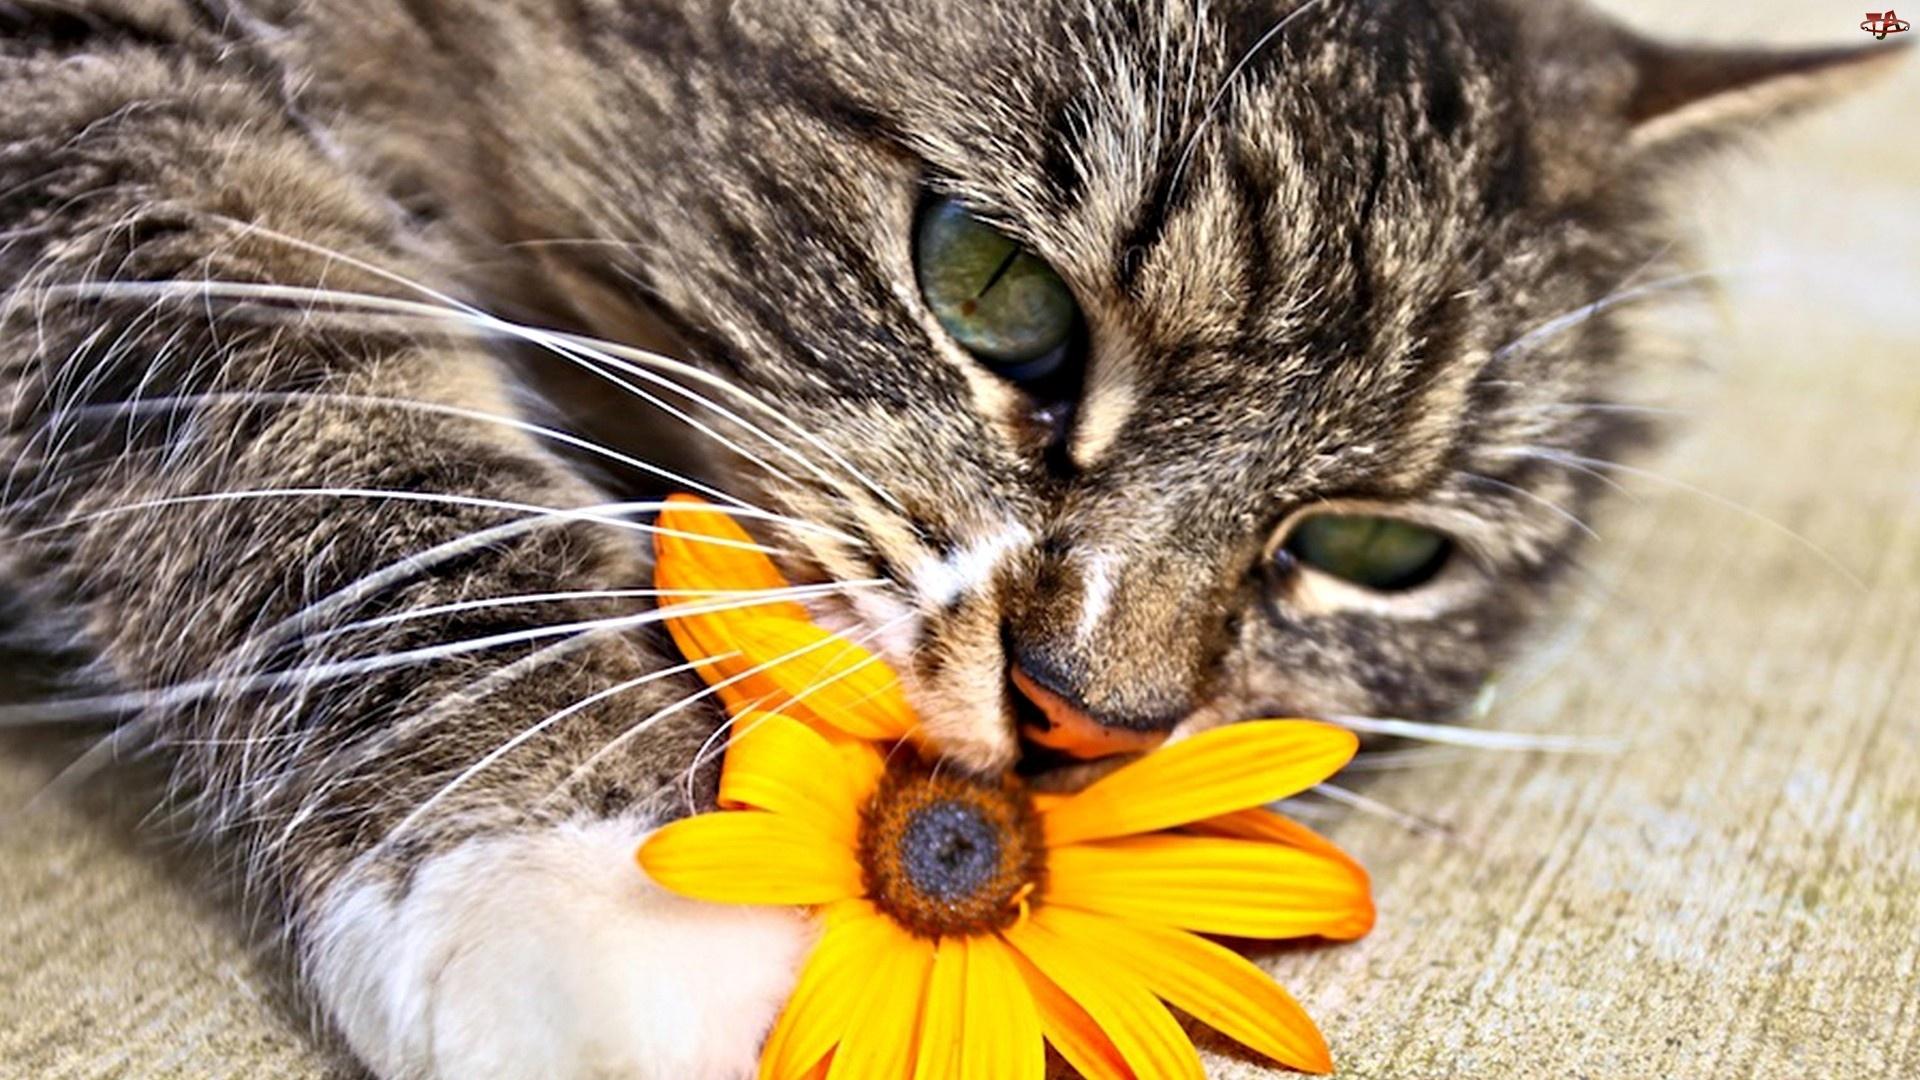 Kotek, Kwiatuszek